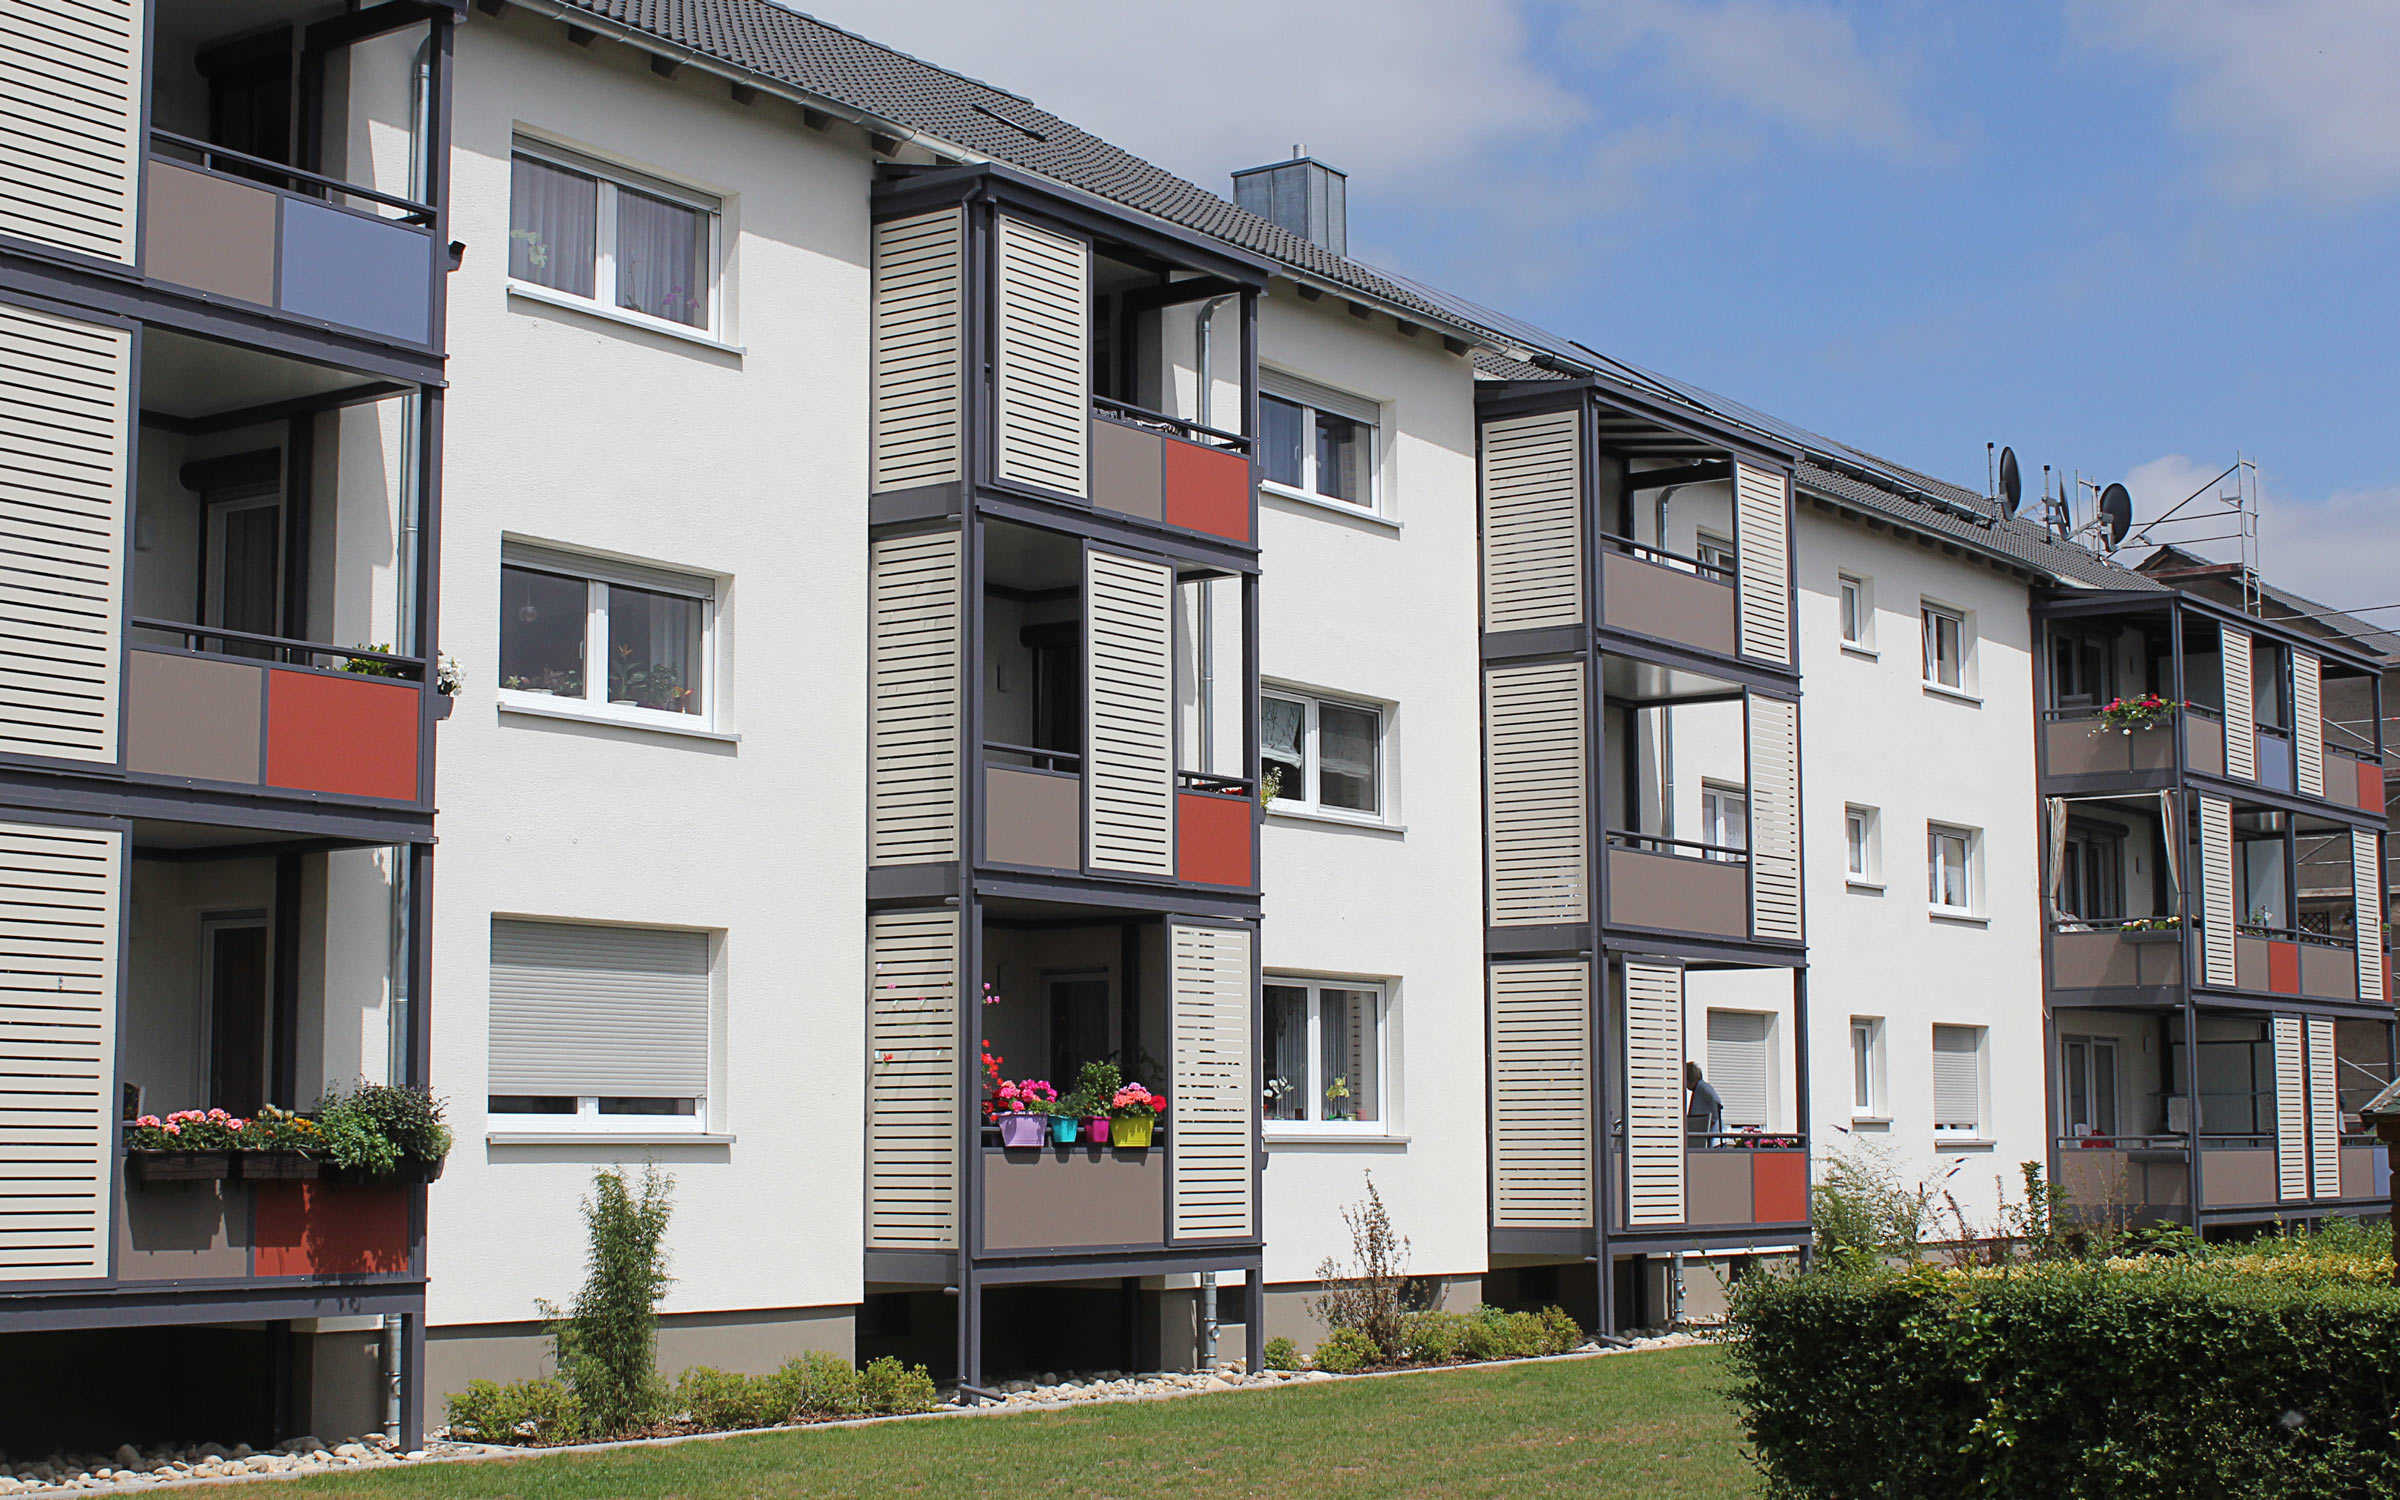 Robert-Koch-Straße, Ginsheim-Gustavsburg